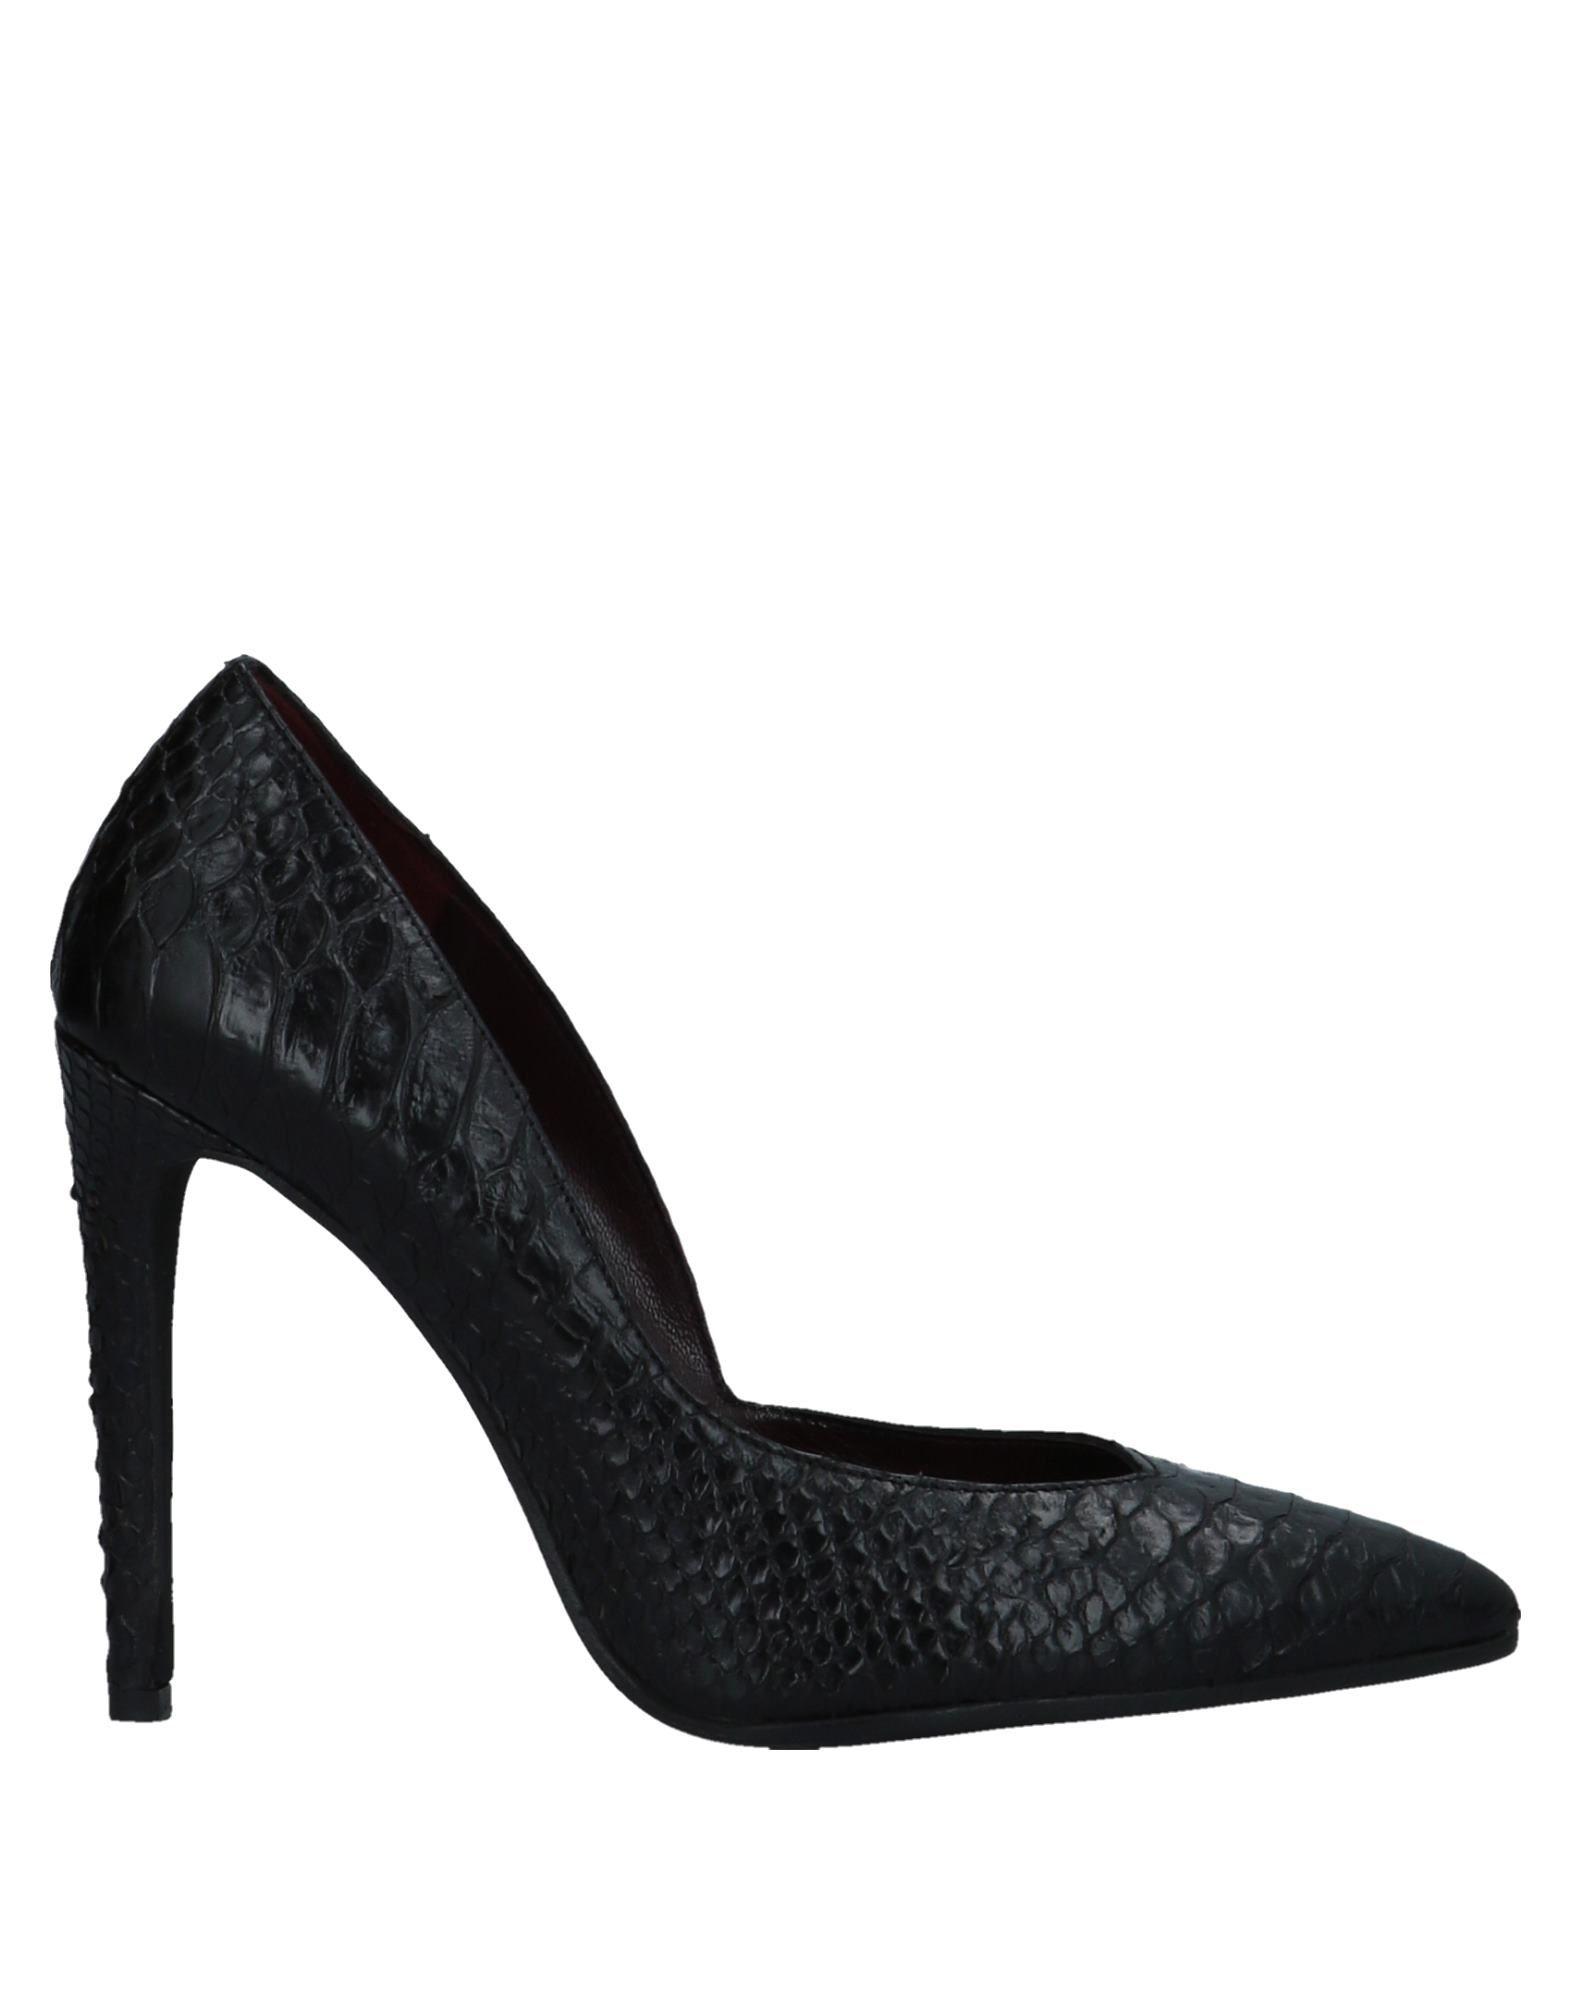 Wo Milano Pumps Damen  11538255DW Gute Qualität beliebte Schuhe